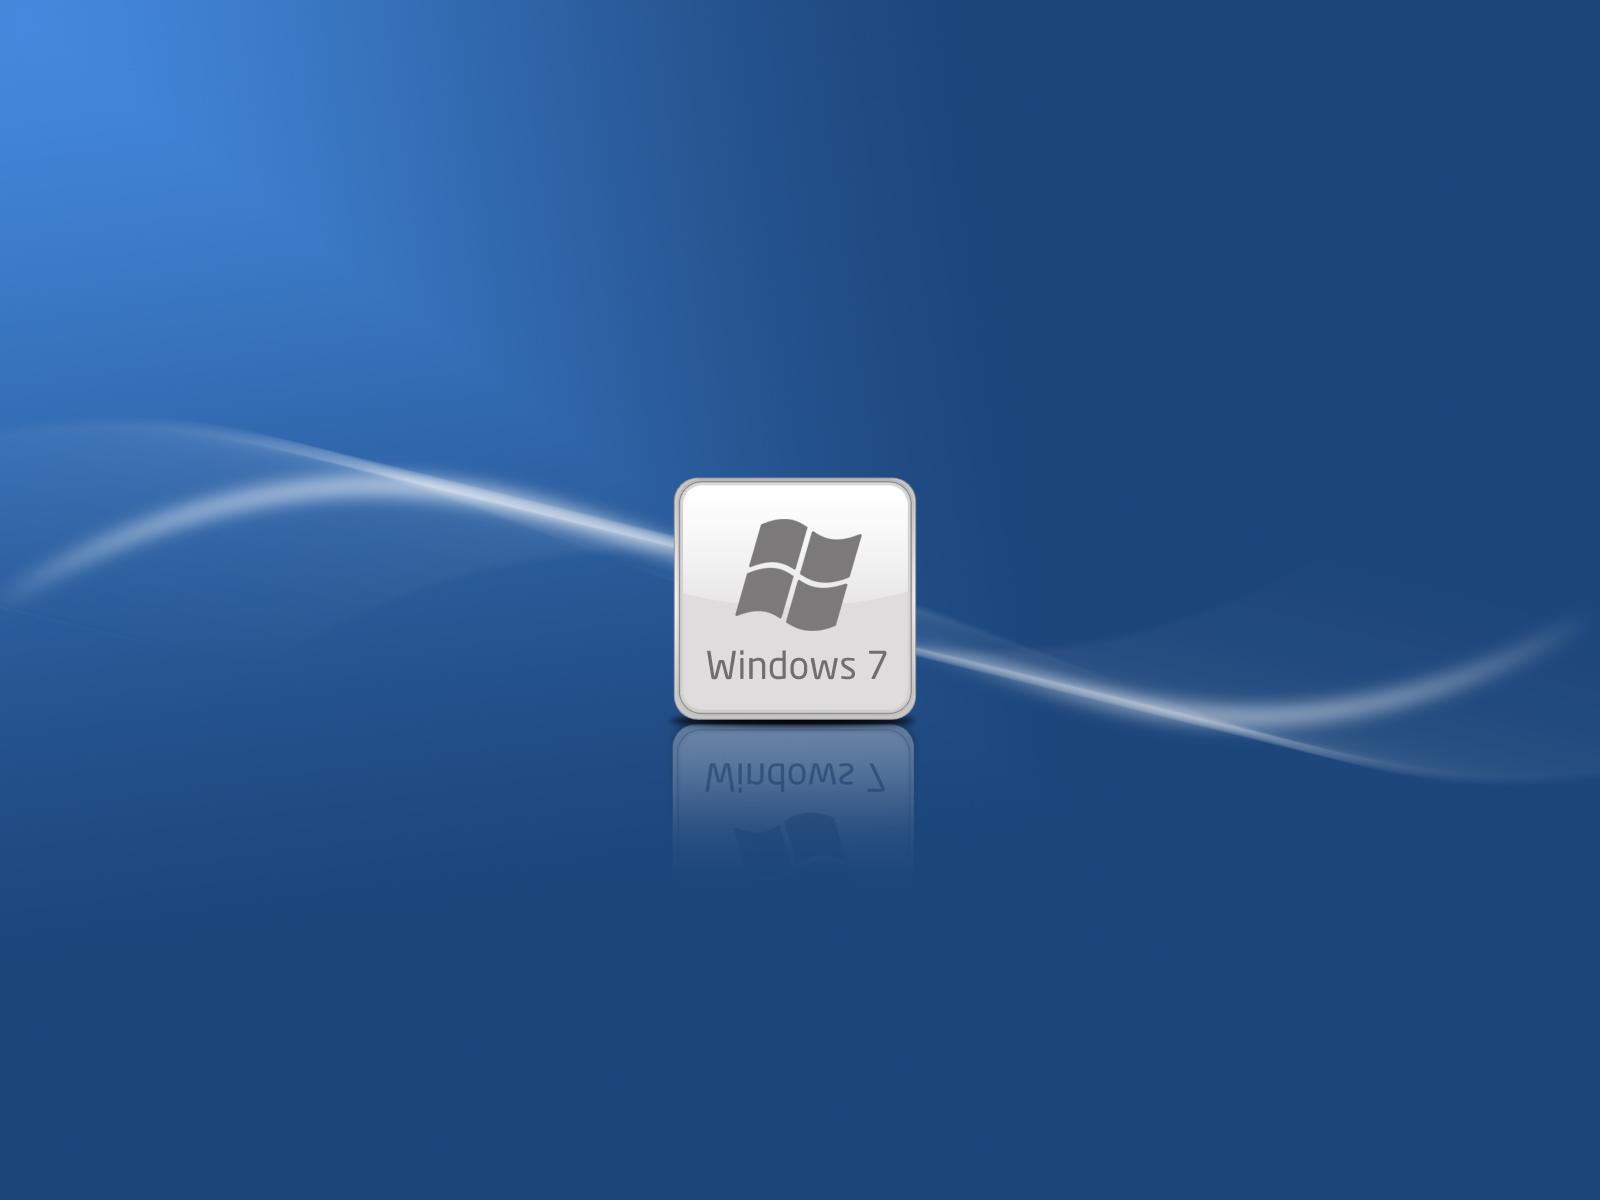 Windows 7 by deviantarnab